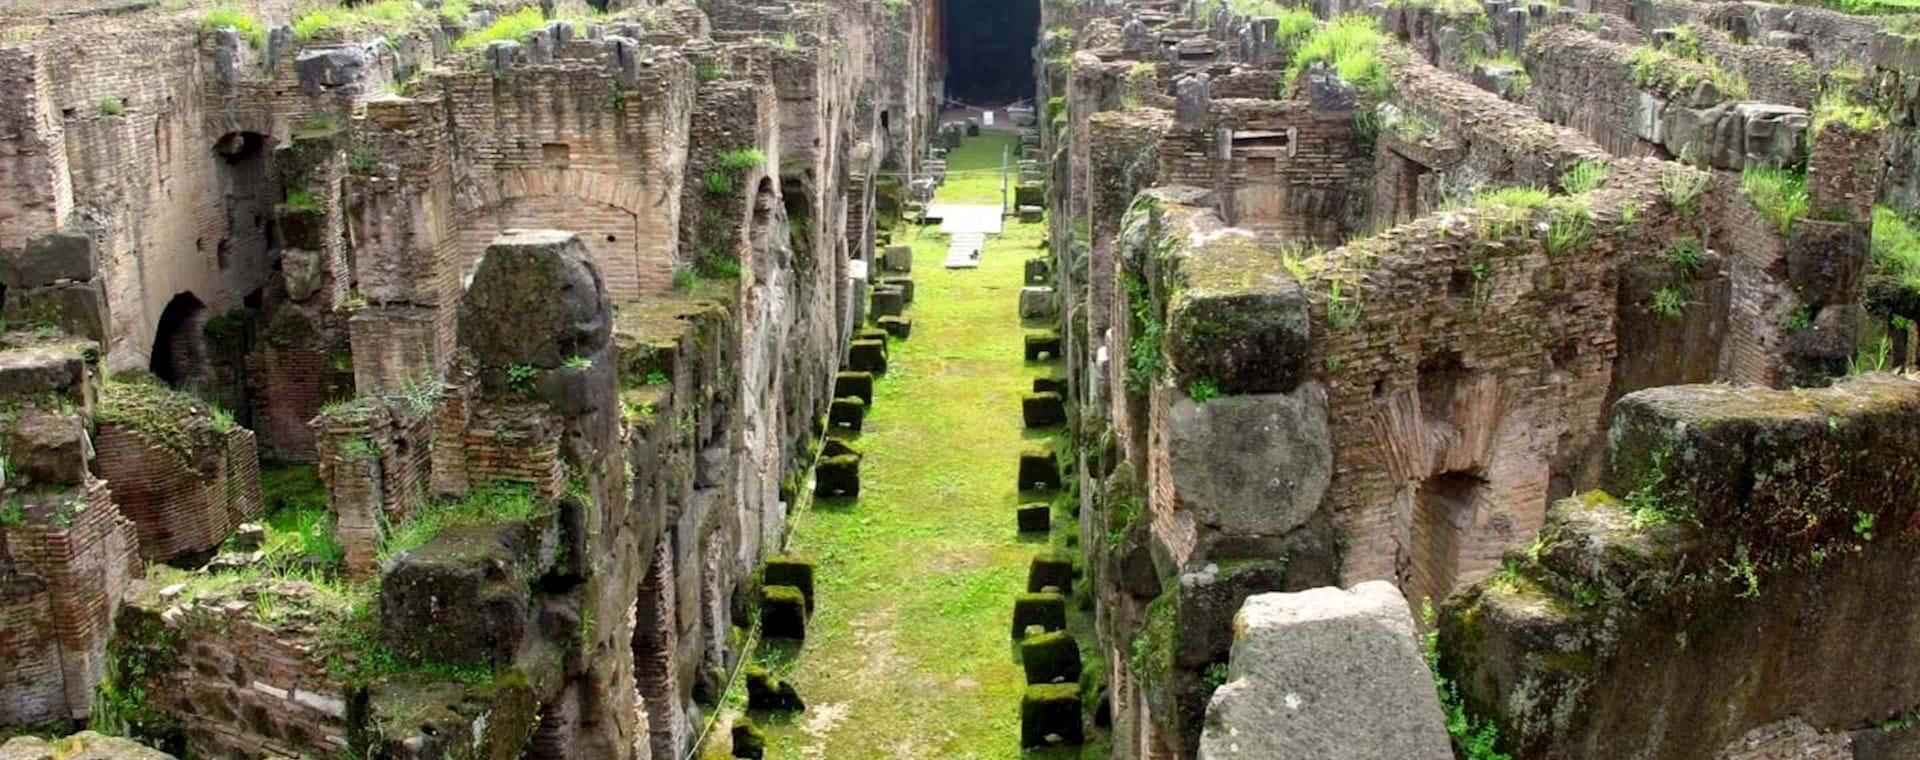 Colosseum Underground Tour with Arena Floor, 2nd Tier & Roman Forum